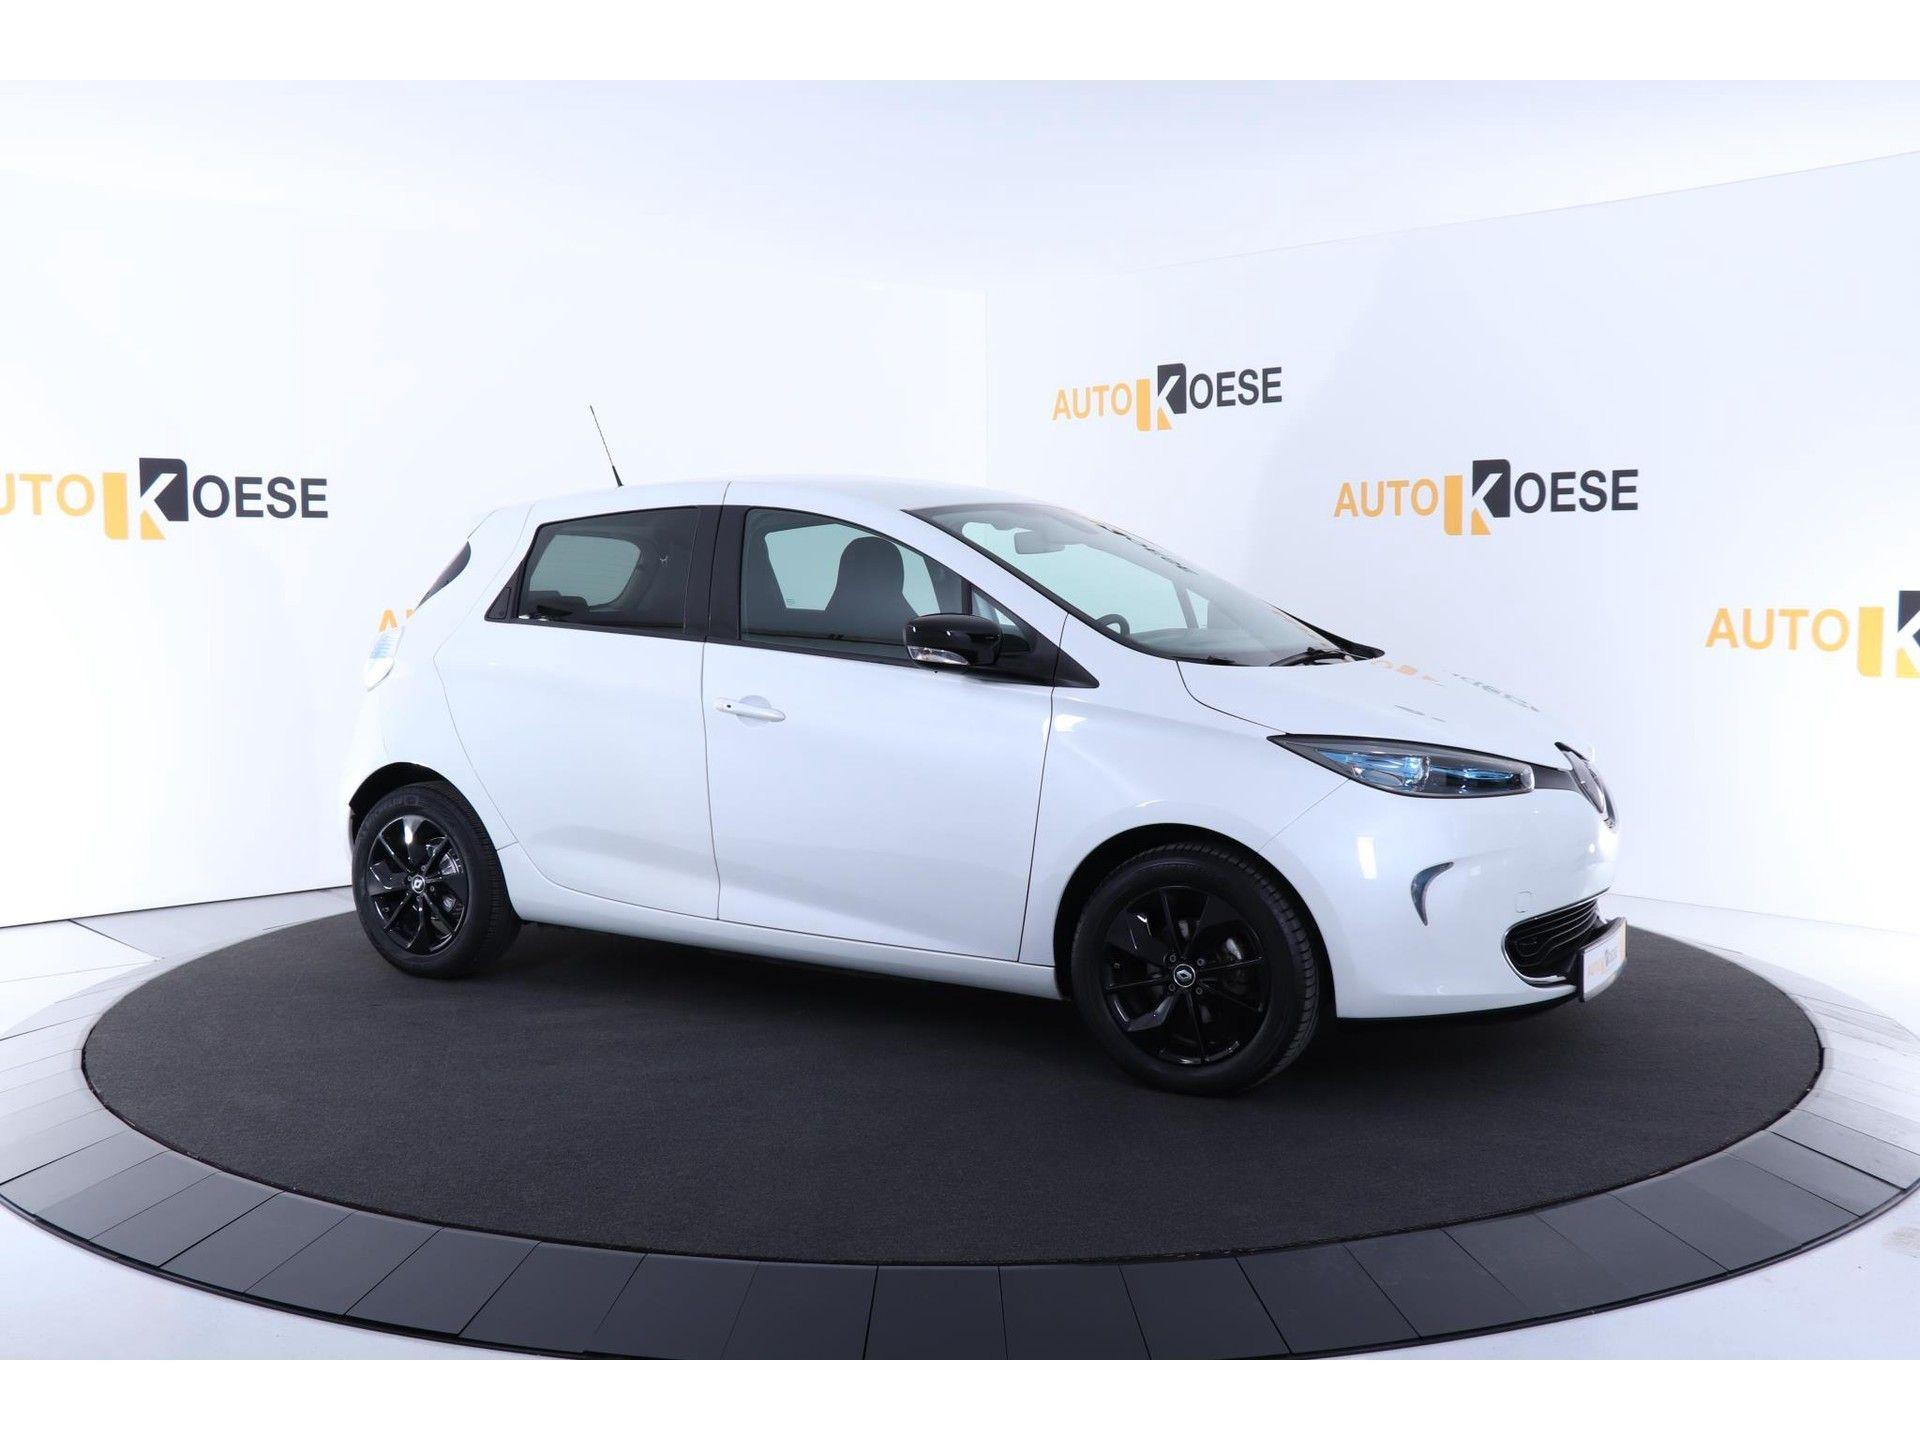 Renault Zoe R90 Intens 41 kWh GROTE RANGE € 16.819 INCL.